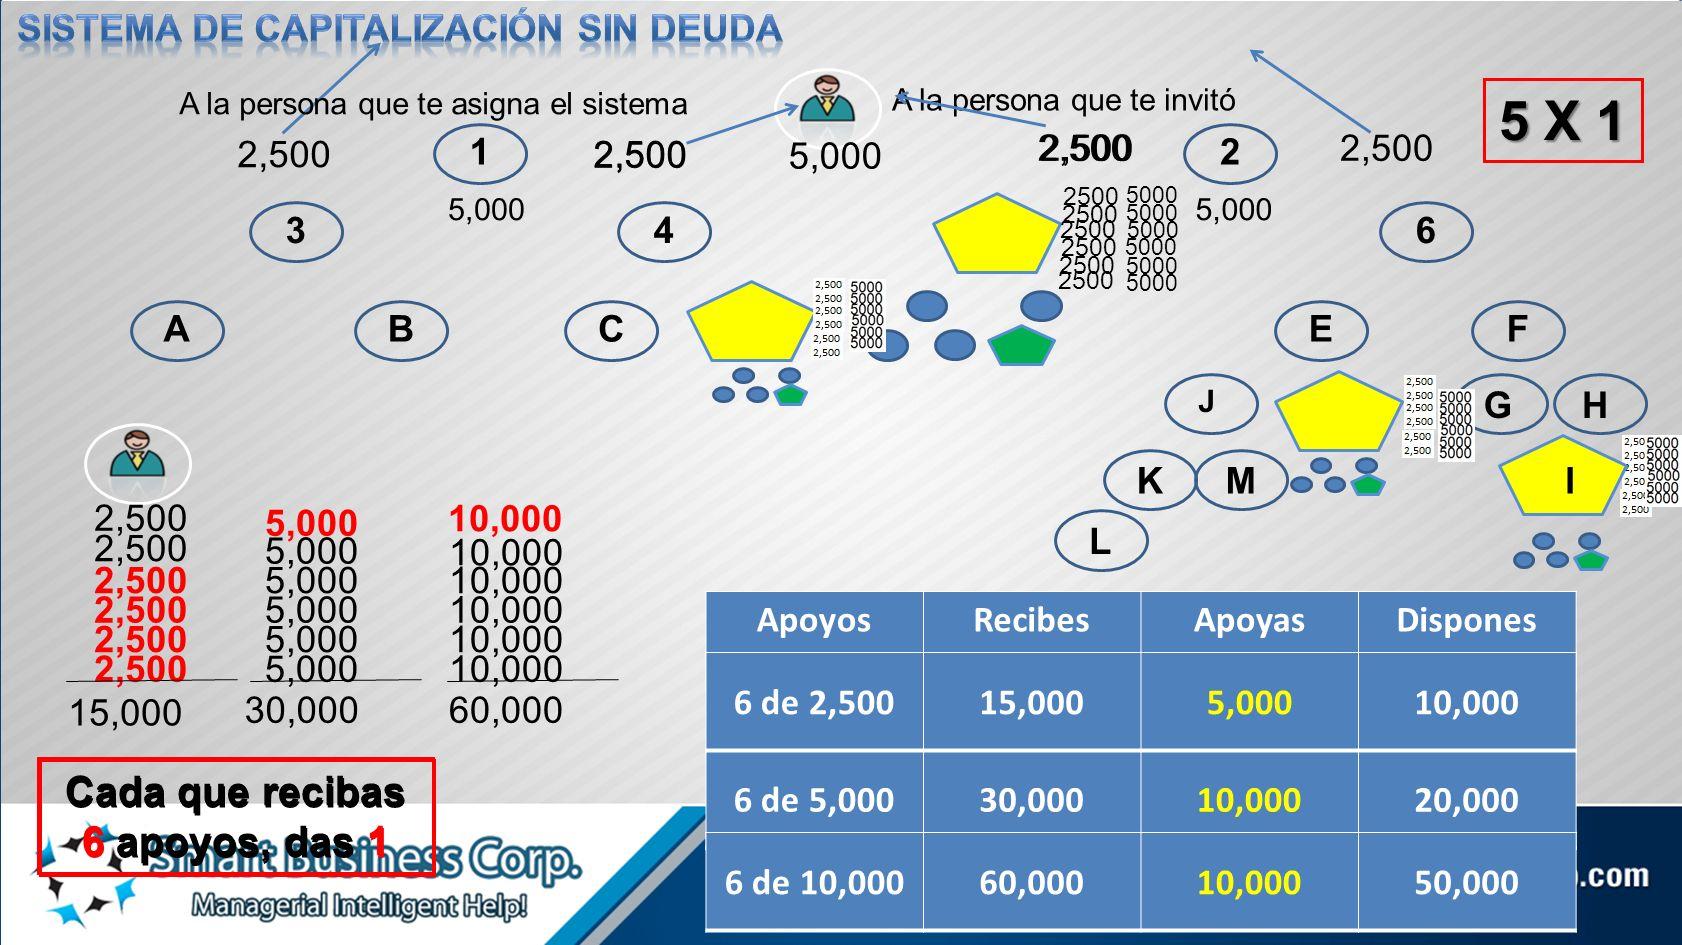 12 3456 ABCDEF GH KM L J N 5,000 2,500 5 X 1 2,500 5,000 2,500 15,000 5,000 30,000 10,000 60,000 Cada que recibas 6 apoyos, das 1 Cada que recibas 6 a